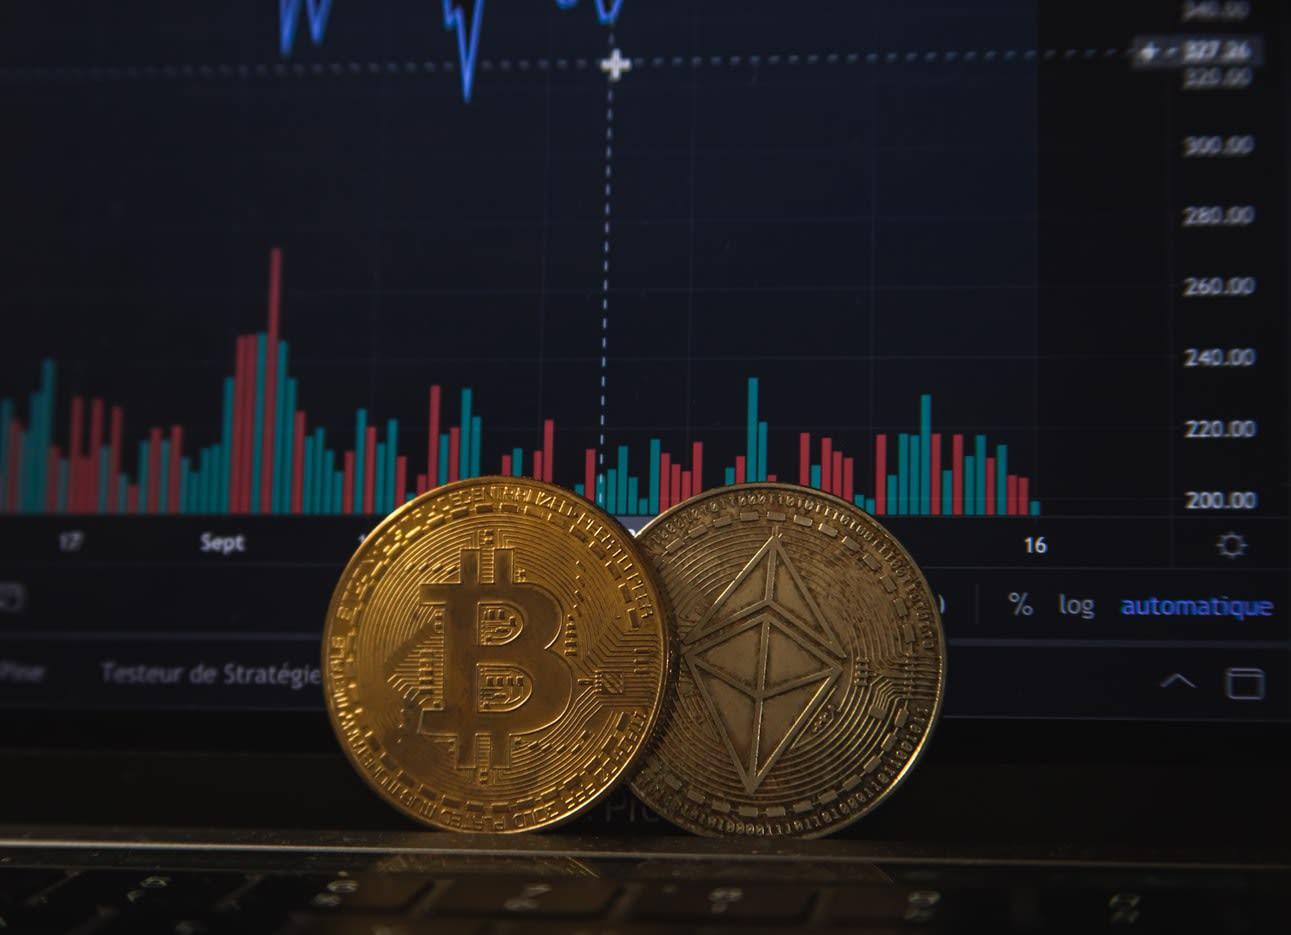 Son PayPal Duyurusundan Sonra Bitcoin Kumarları Artacak